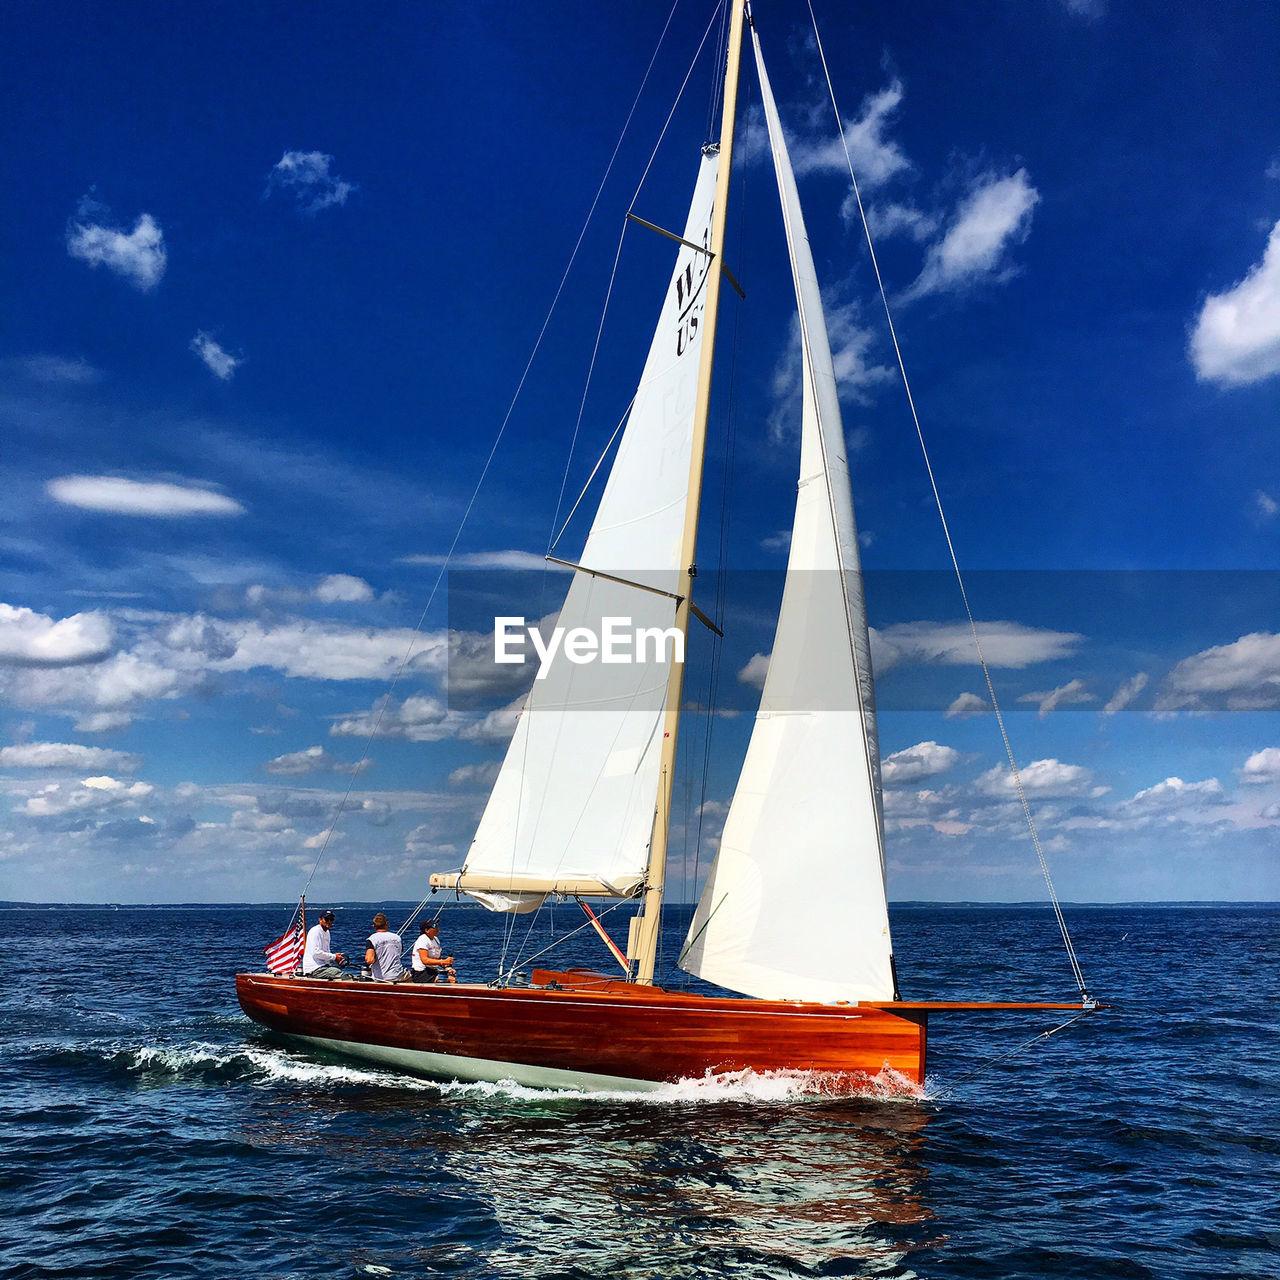 SAILBOAT IN CALM SEA